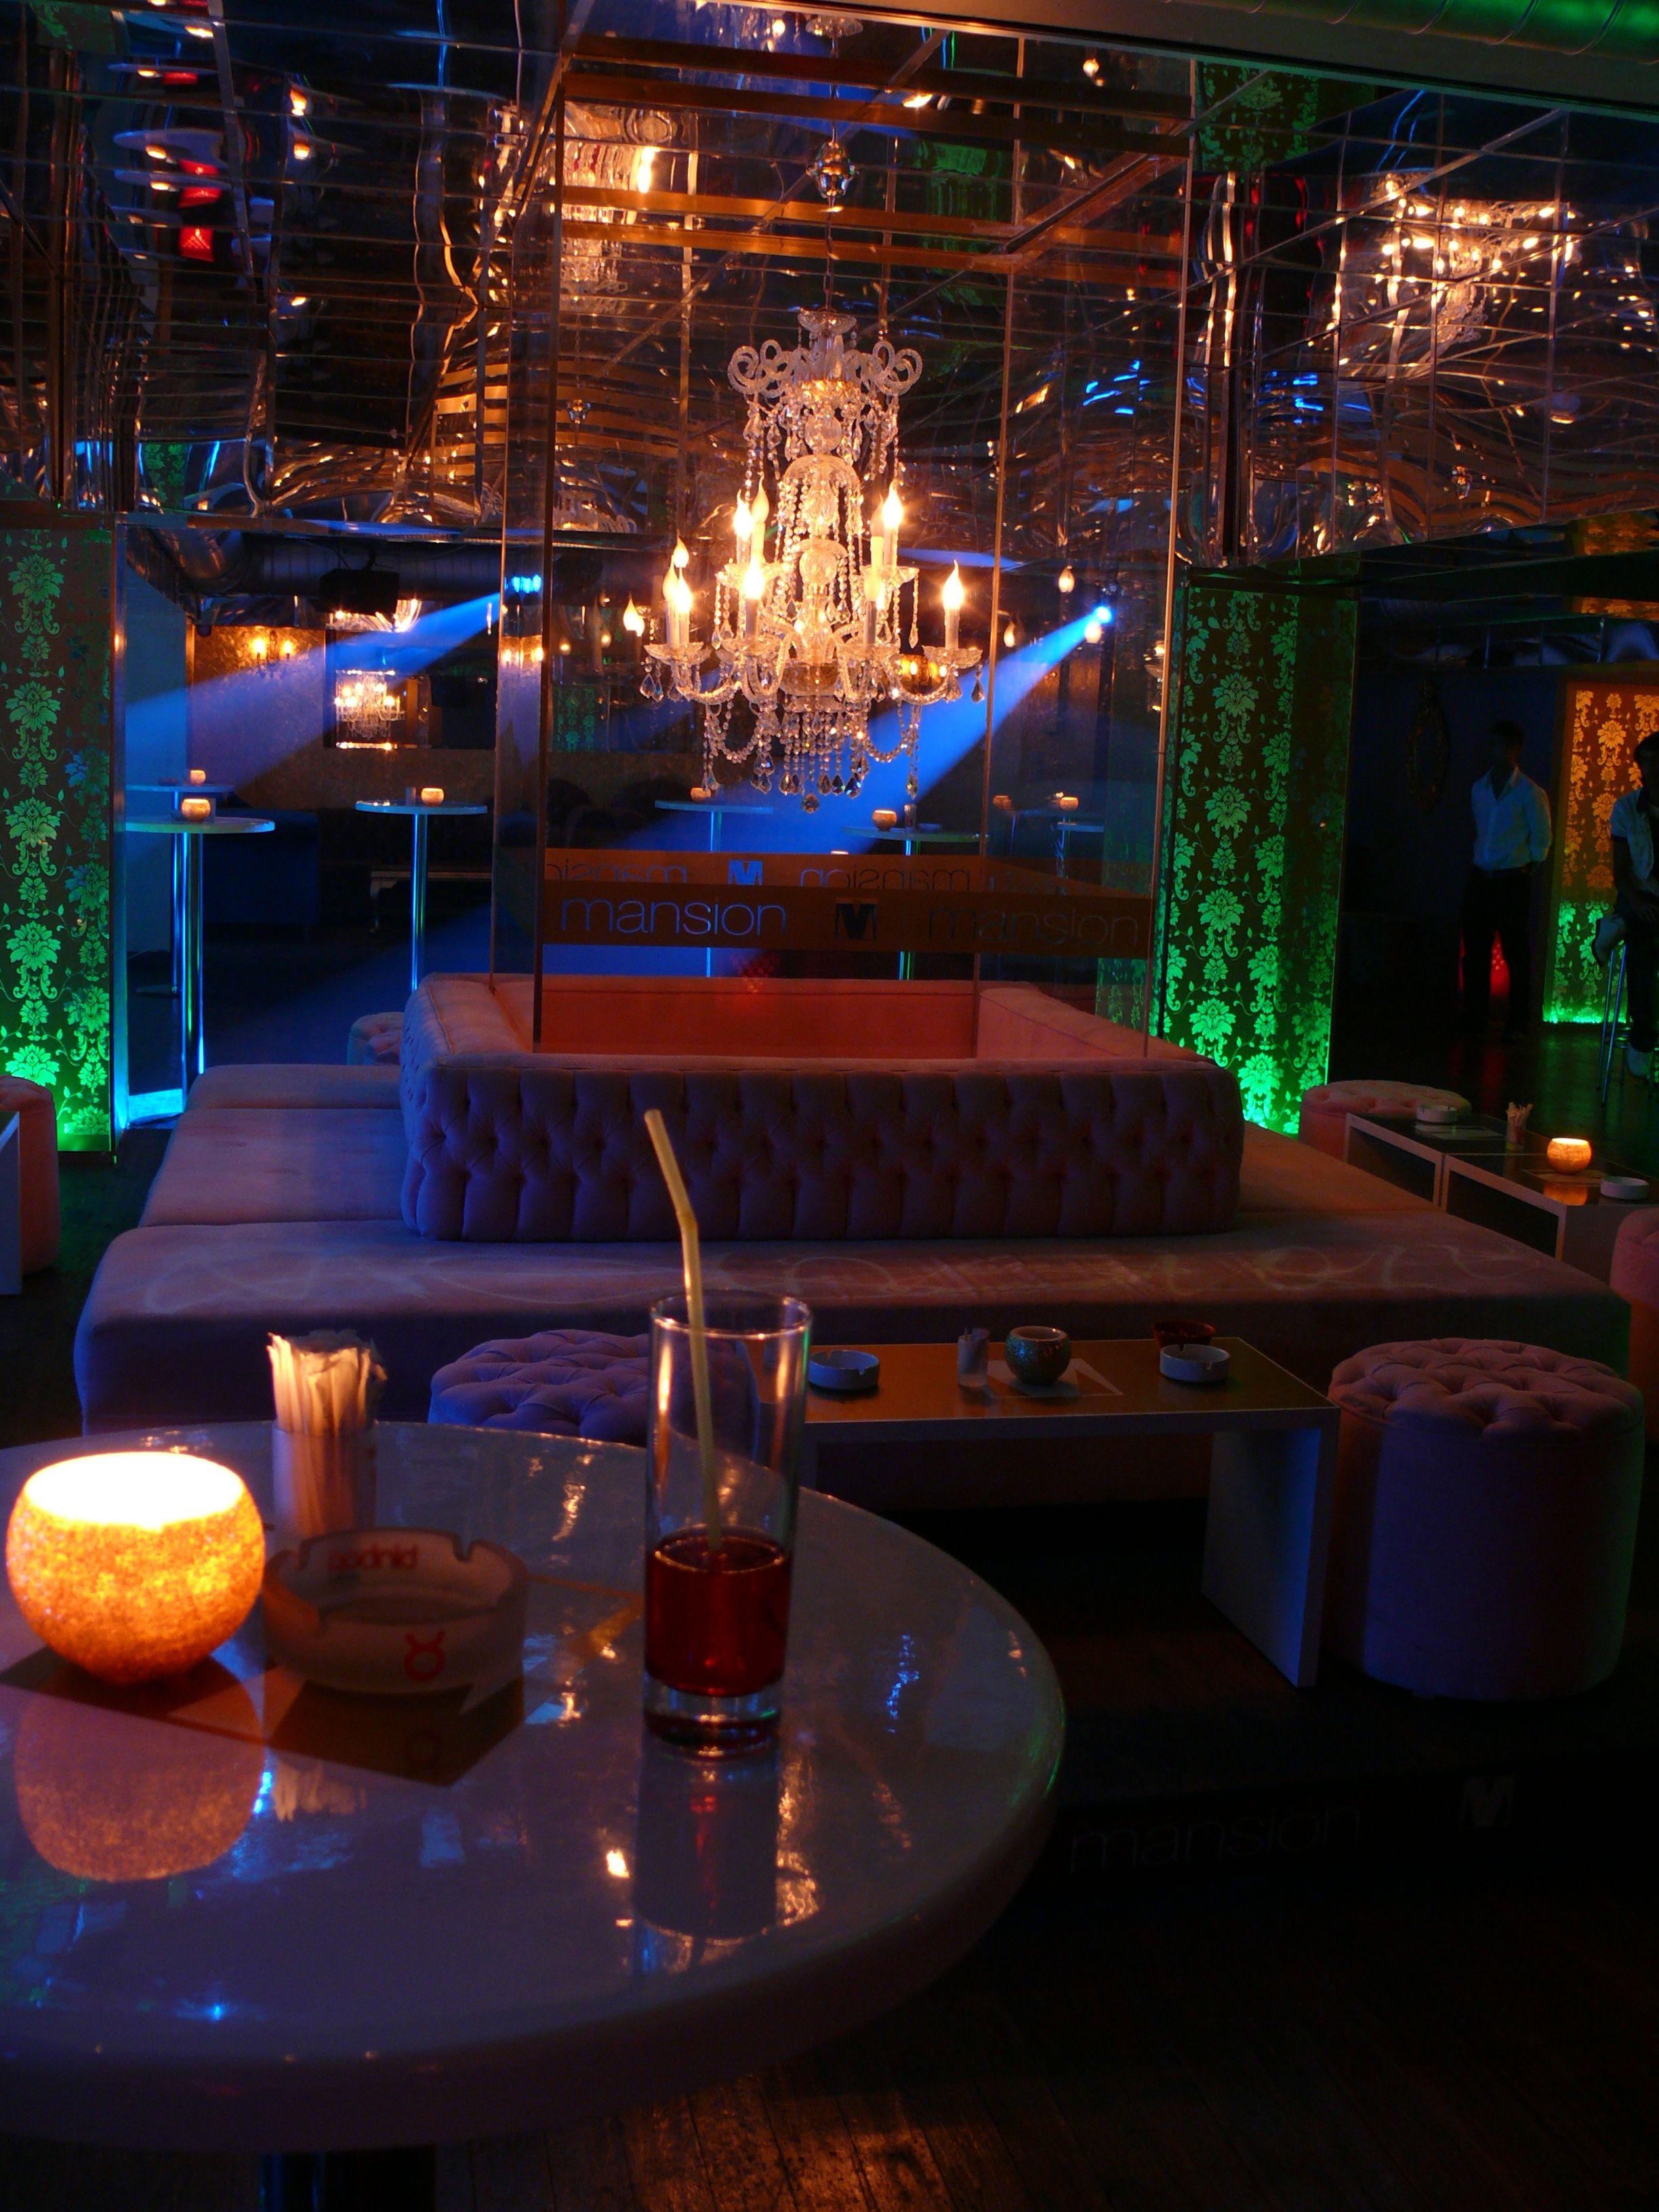 Night Club Interior Design by Chefs Design | Restaurant-Cafe-Bar in ...